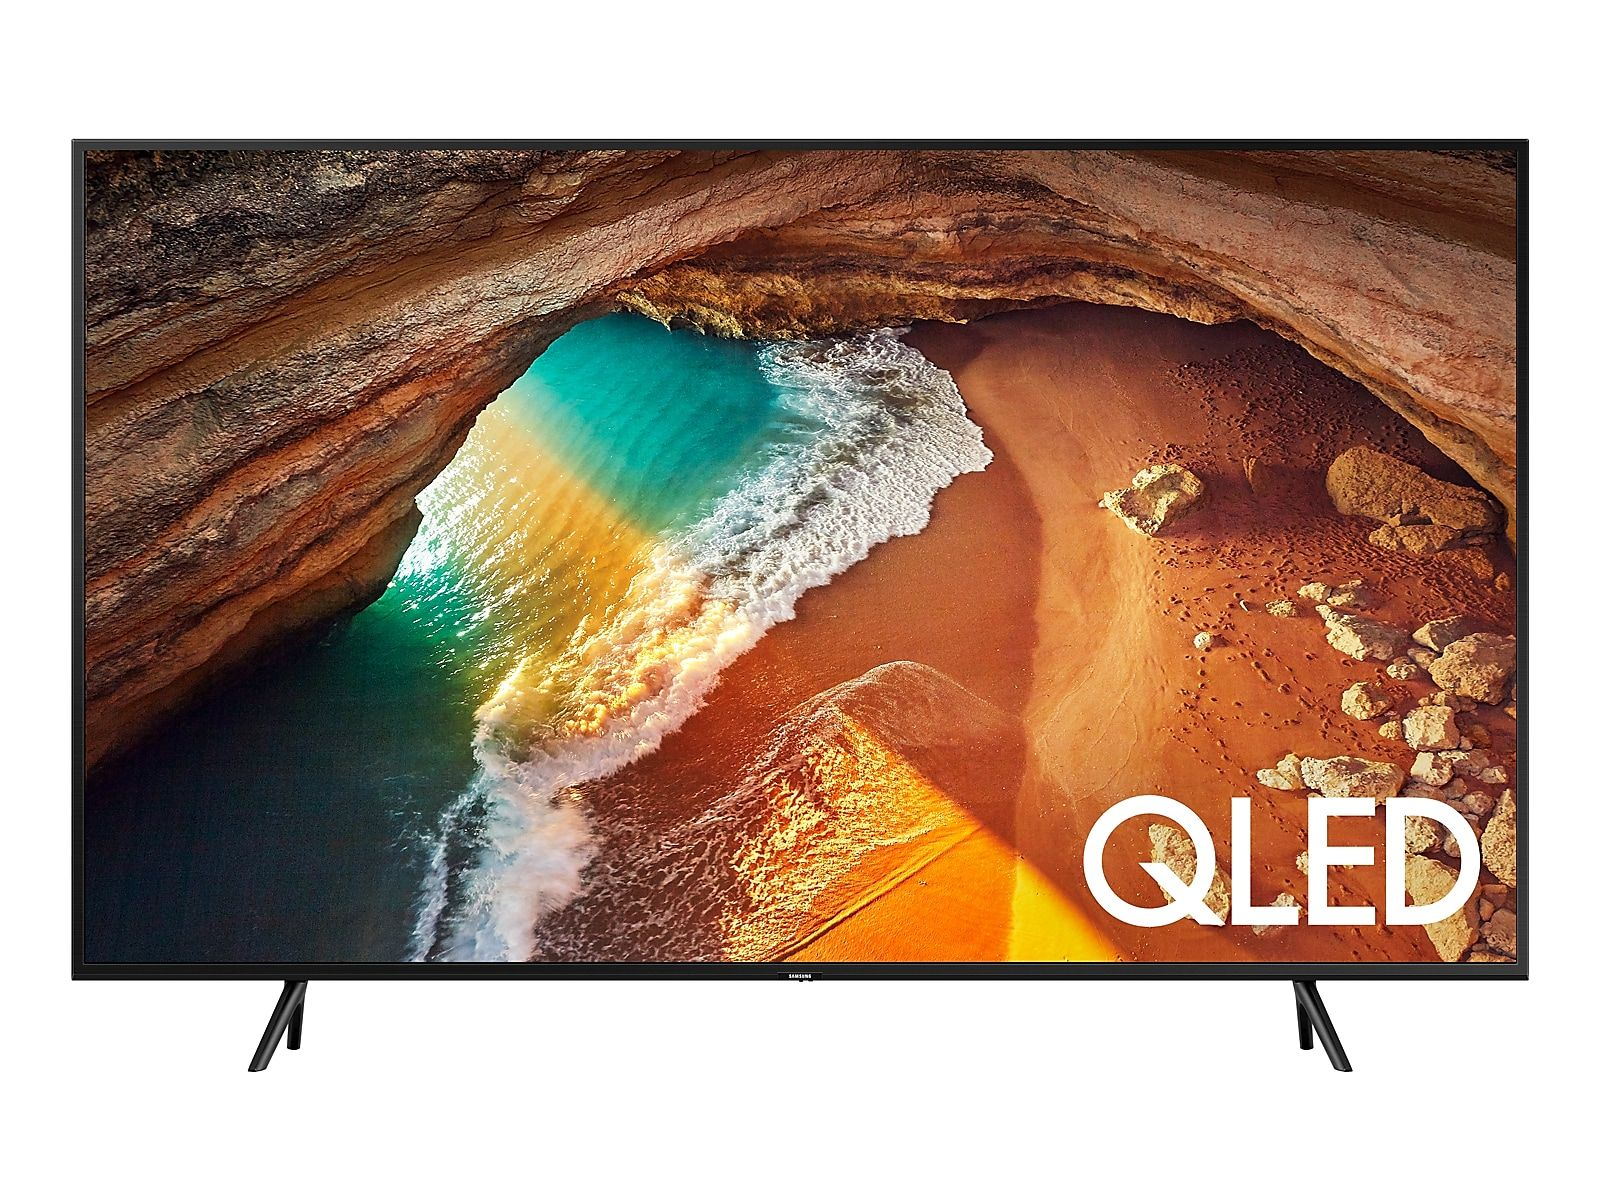 49 Class Q60r Qled Smart 4k Uhd Tv 2019 Samsung Smart Tv Smart Tv Samsung